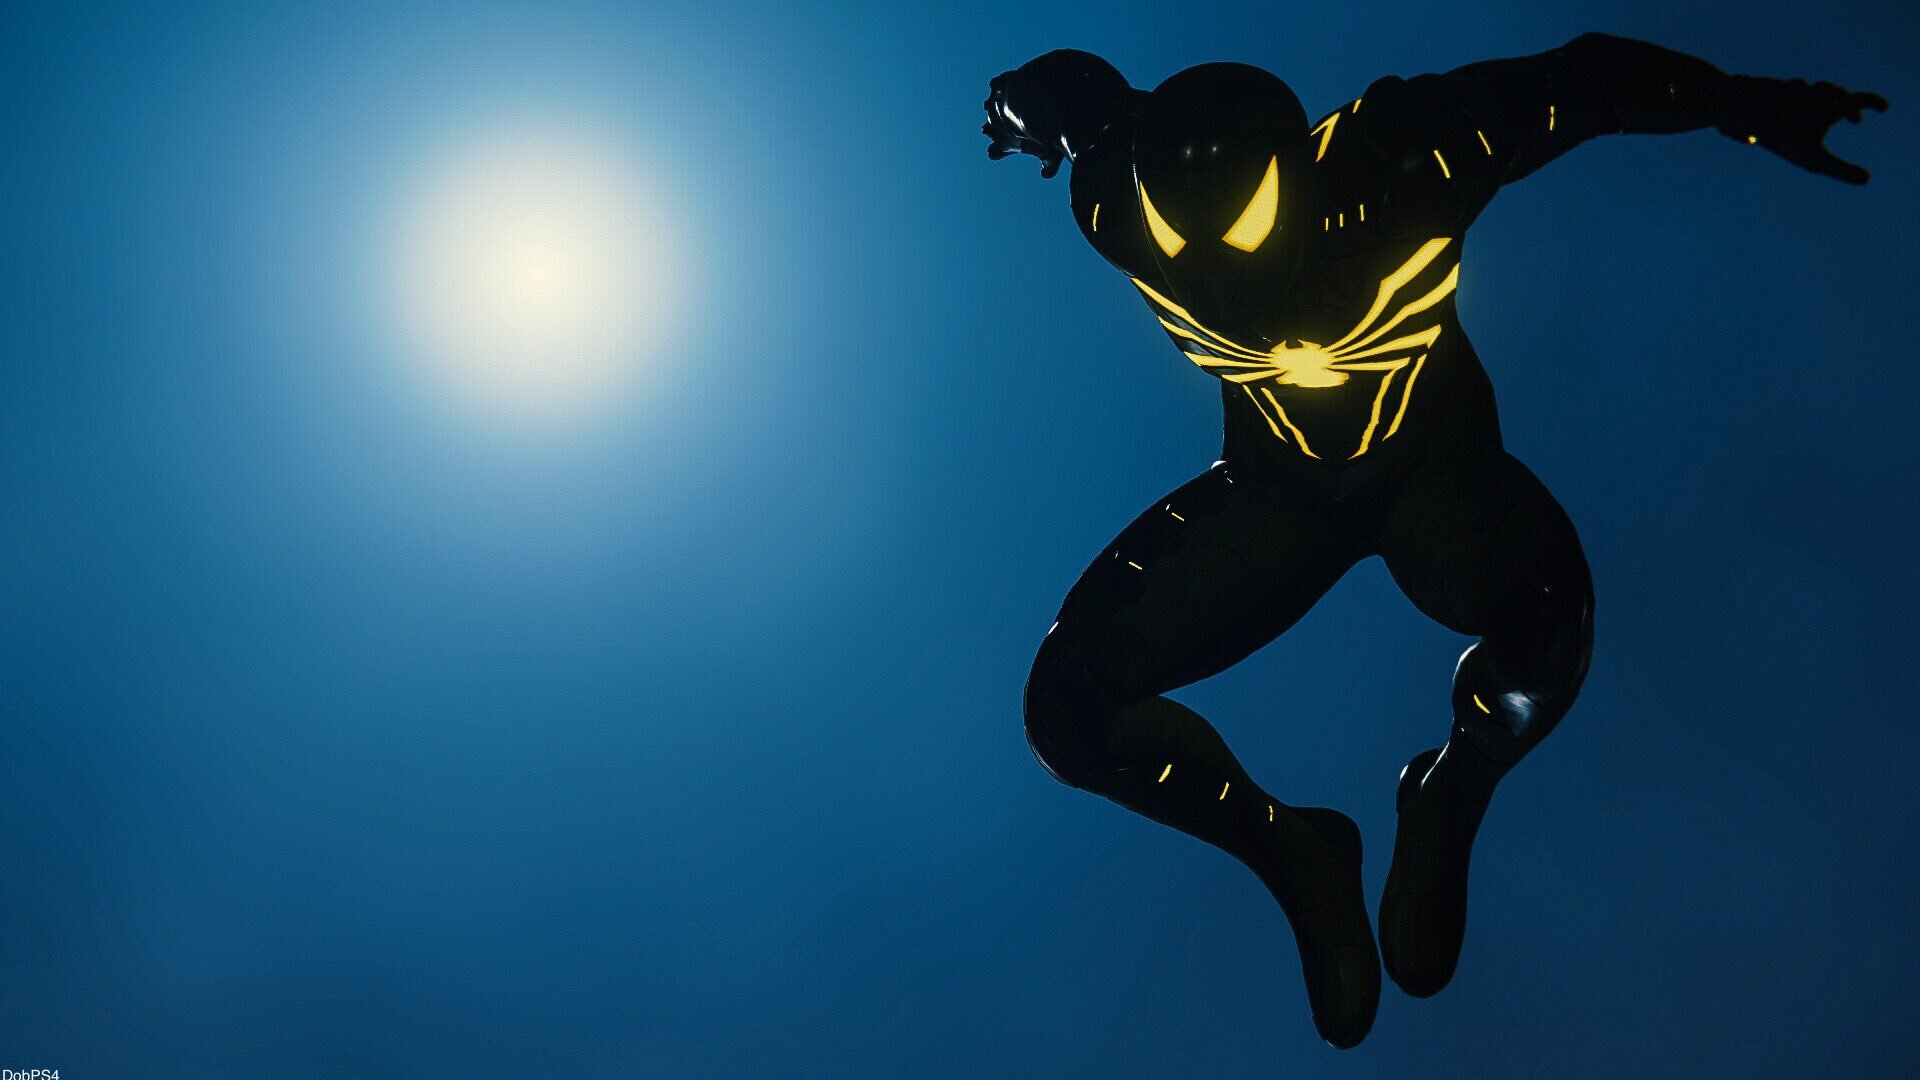 1920x1080 Black Suit Spiderman PS4 Pro Game Laptop Full HD ...